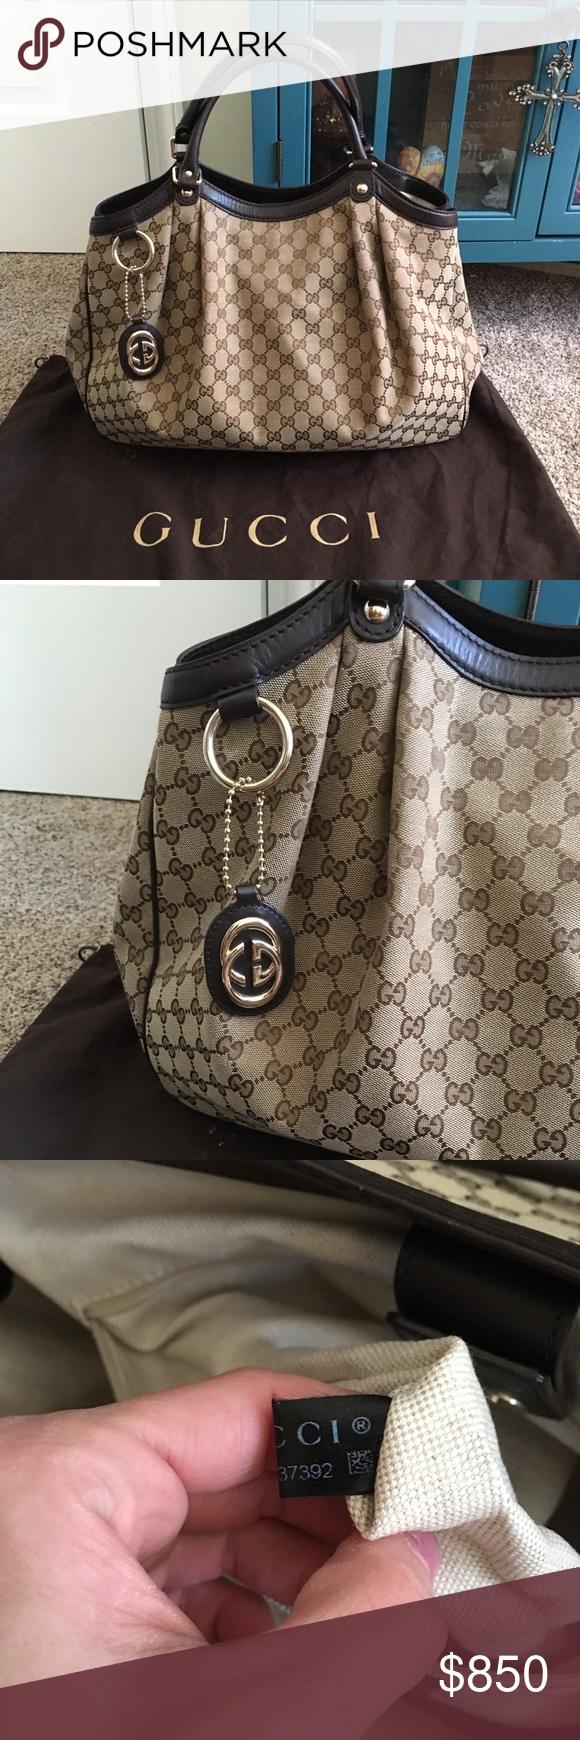 573500c3ca52 Gucci Sukey Tote Buy/Trade Authentic Gucci Sukey canvas/leather large tote